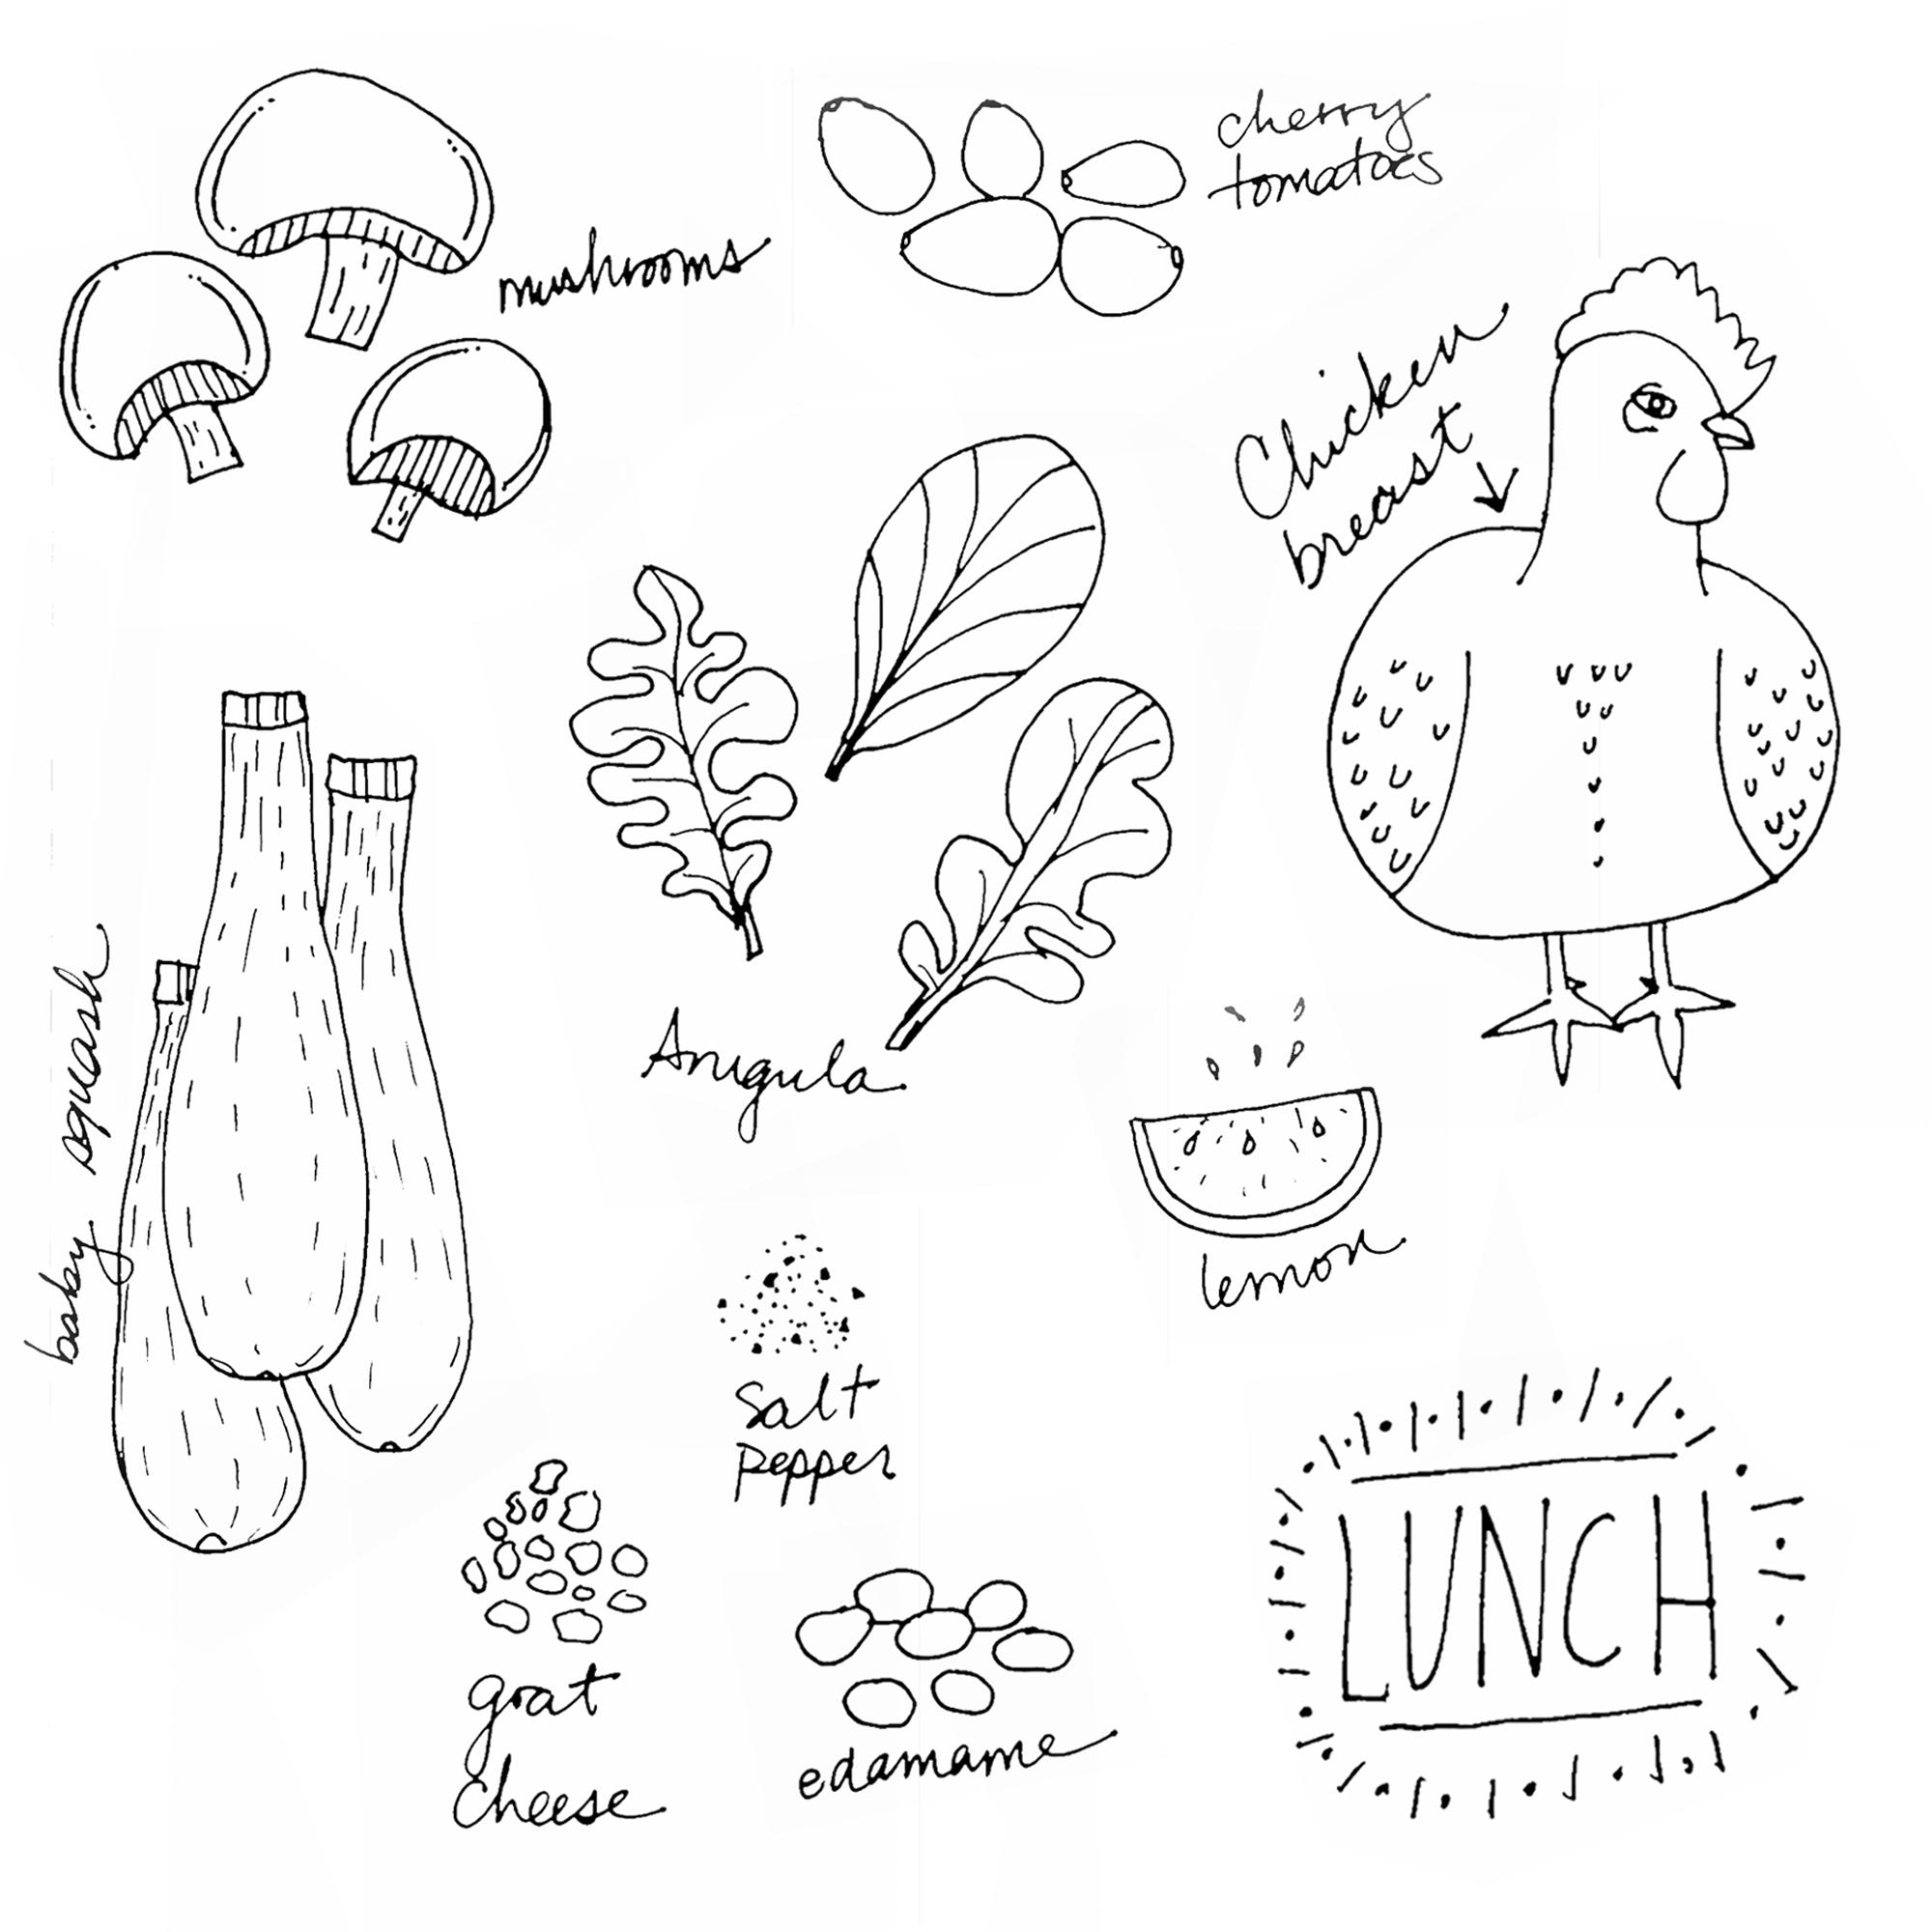 Lunch_Illustrations_2000x2000_.jpg